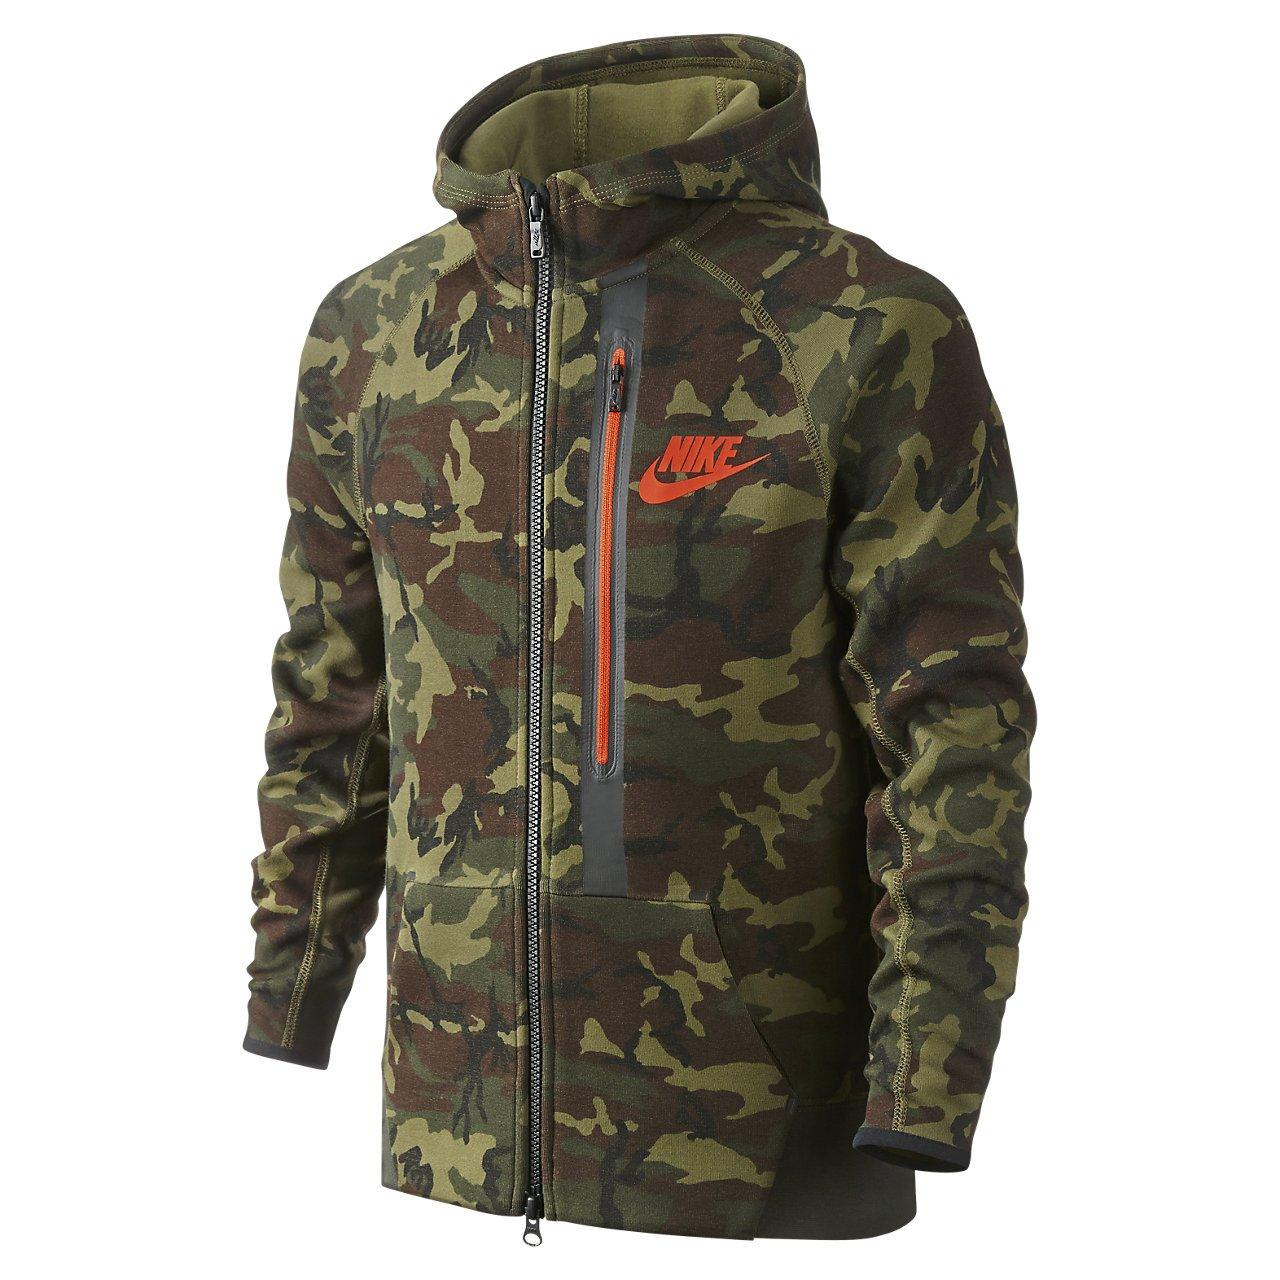 9fb6425dda1f Amazon.com  Nike Youth Boys Tech Fleece Allover Print Full-Zip Hoodie  716805-355 (Large) Camo Green  Clothing